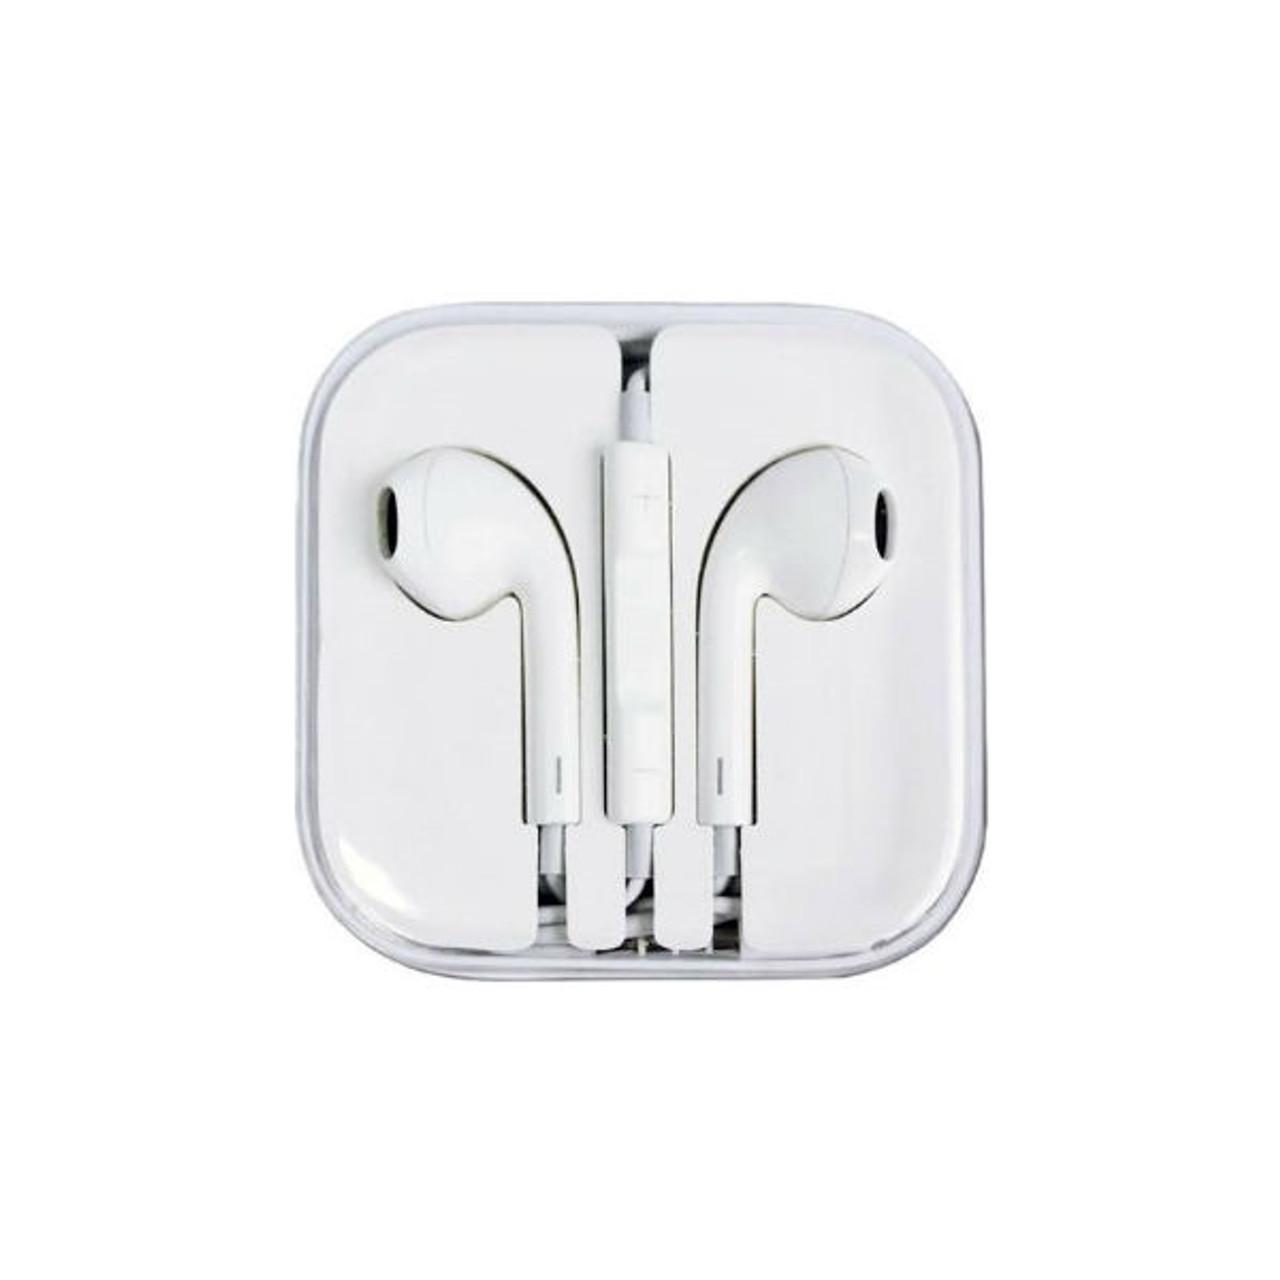 3a1ffc5f9e0 EarPods with 3.5 mm Headphone Plug   mac of all trades